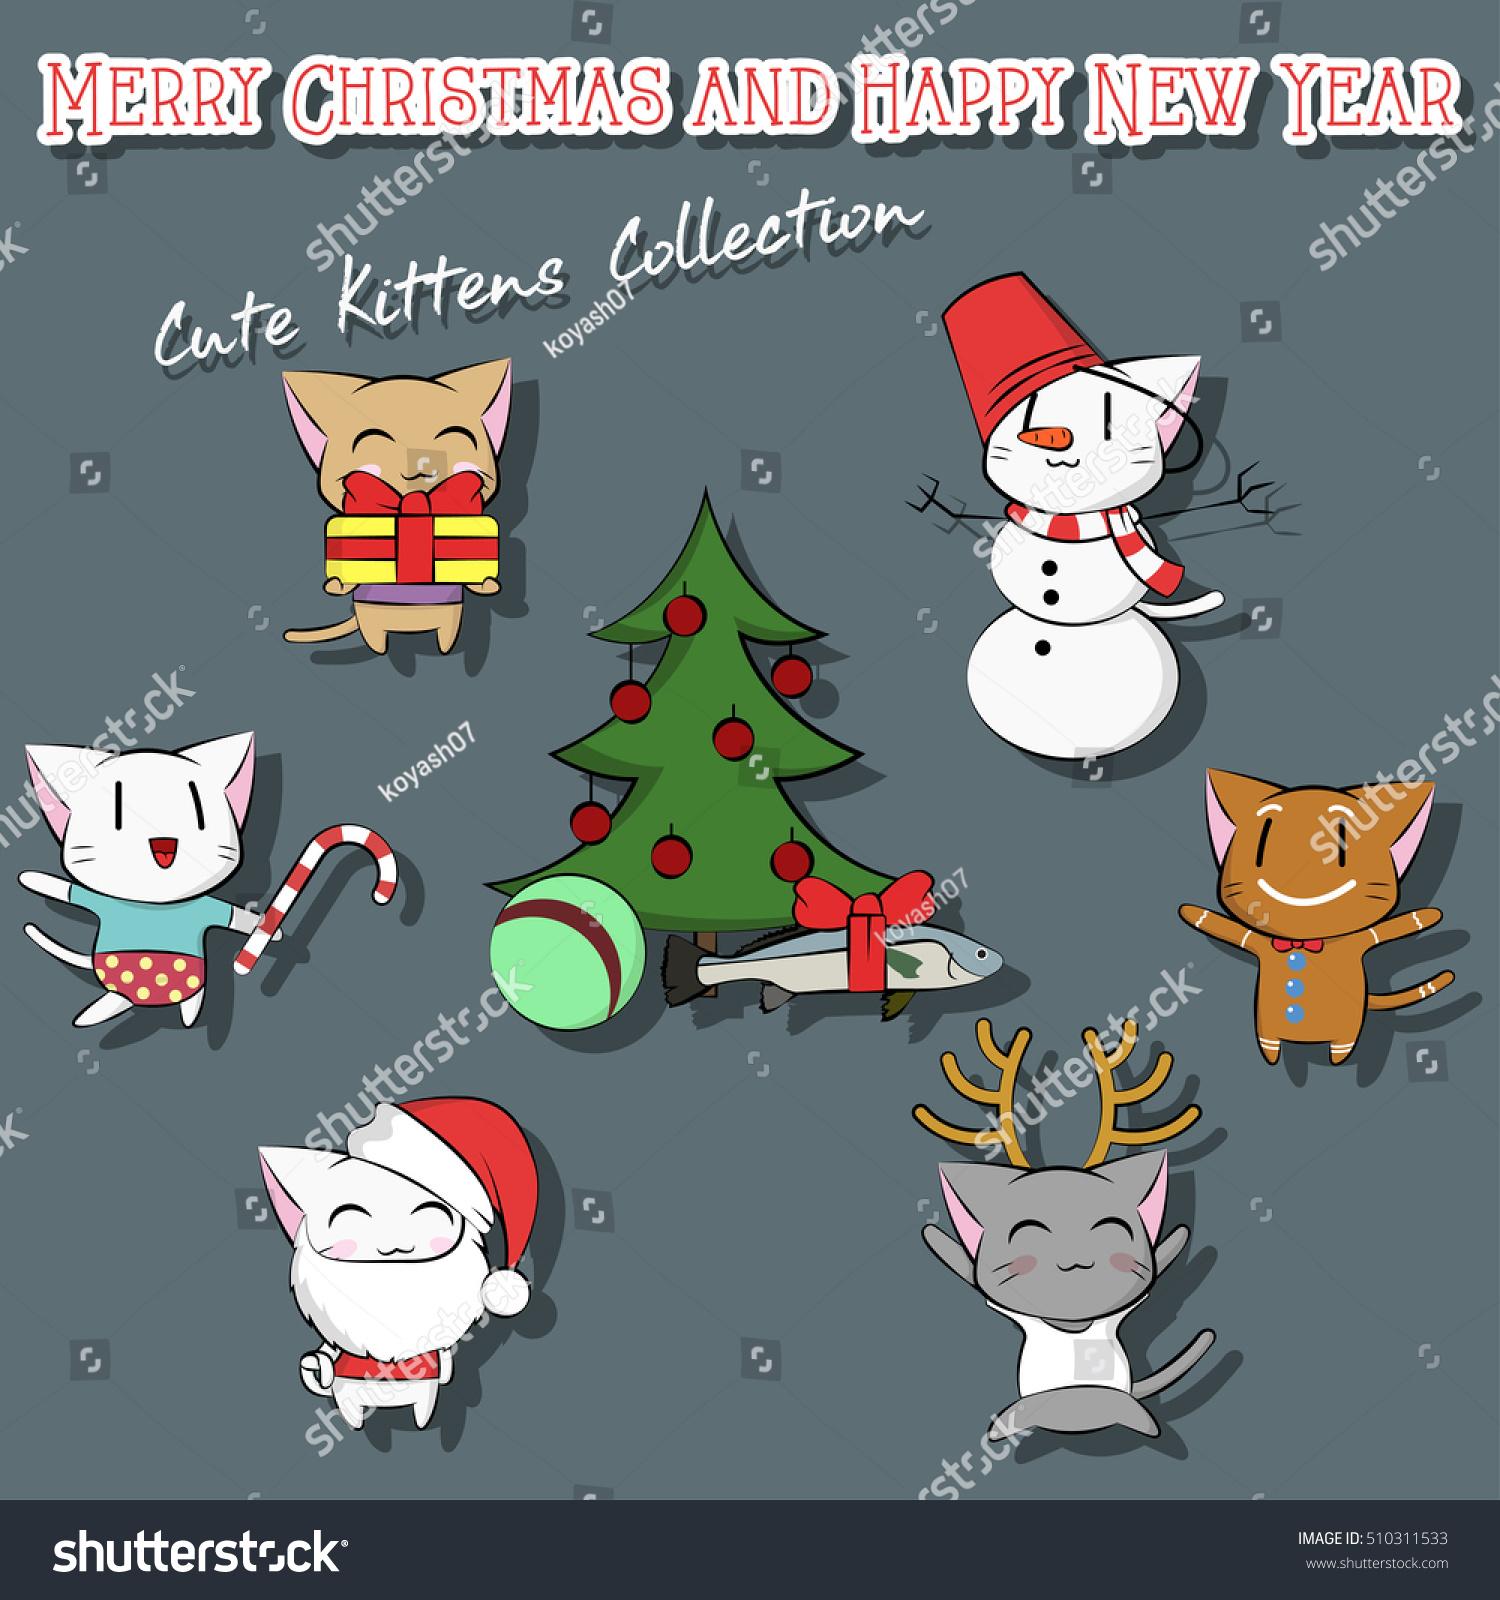 Kitties And New Year Greetings